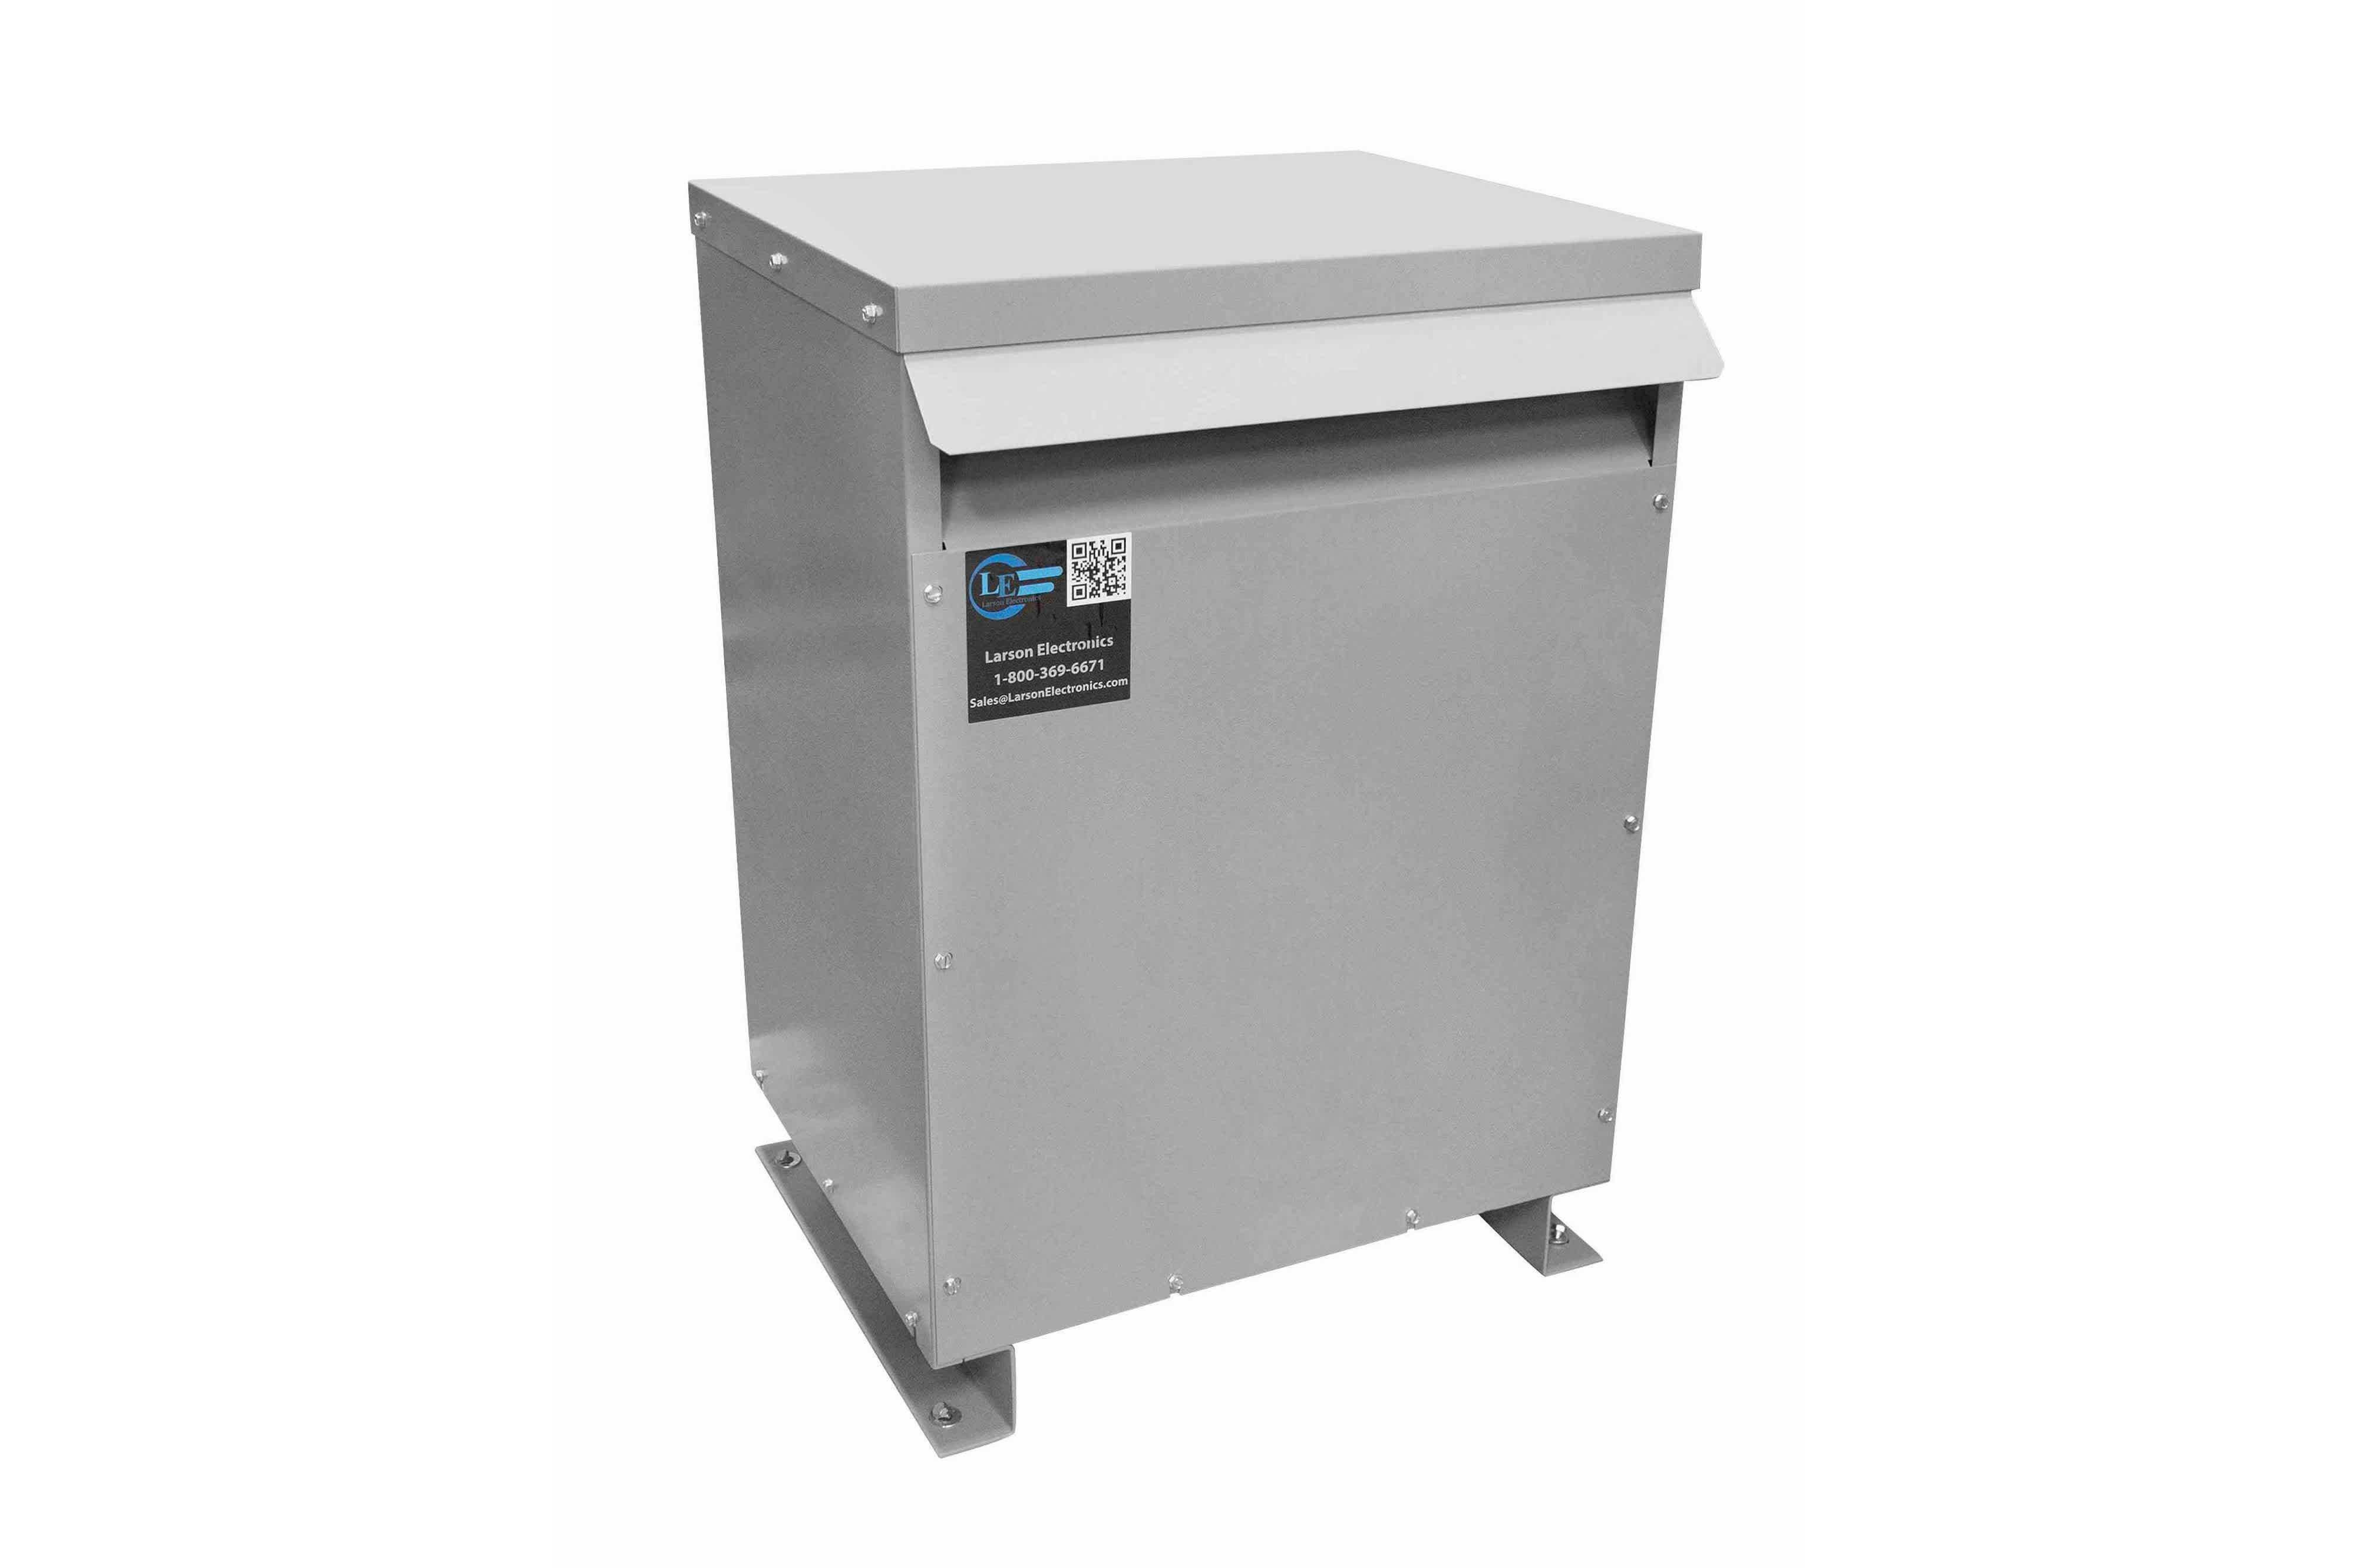 9 kVA 3PH Isolation Transformer, 480V Wye Primary, 415V Delta Secondary, N3R, Ventilated, 60 Hz